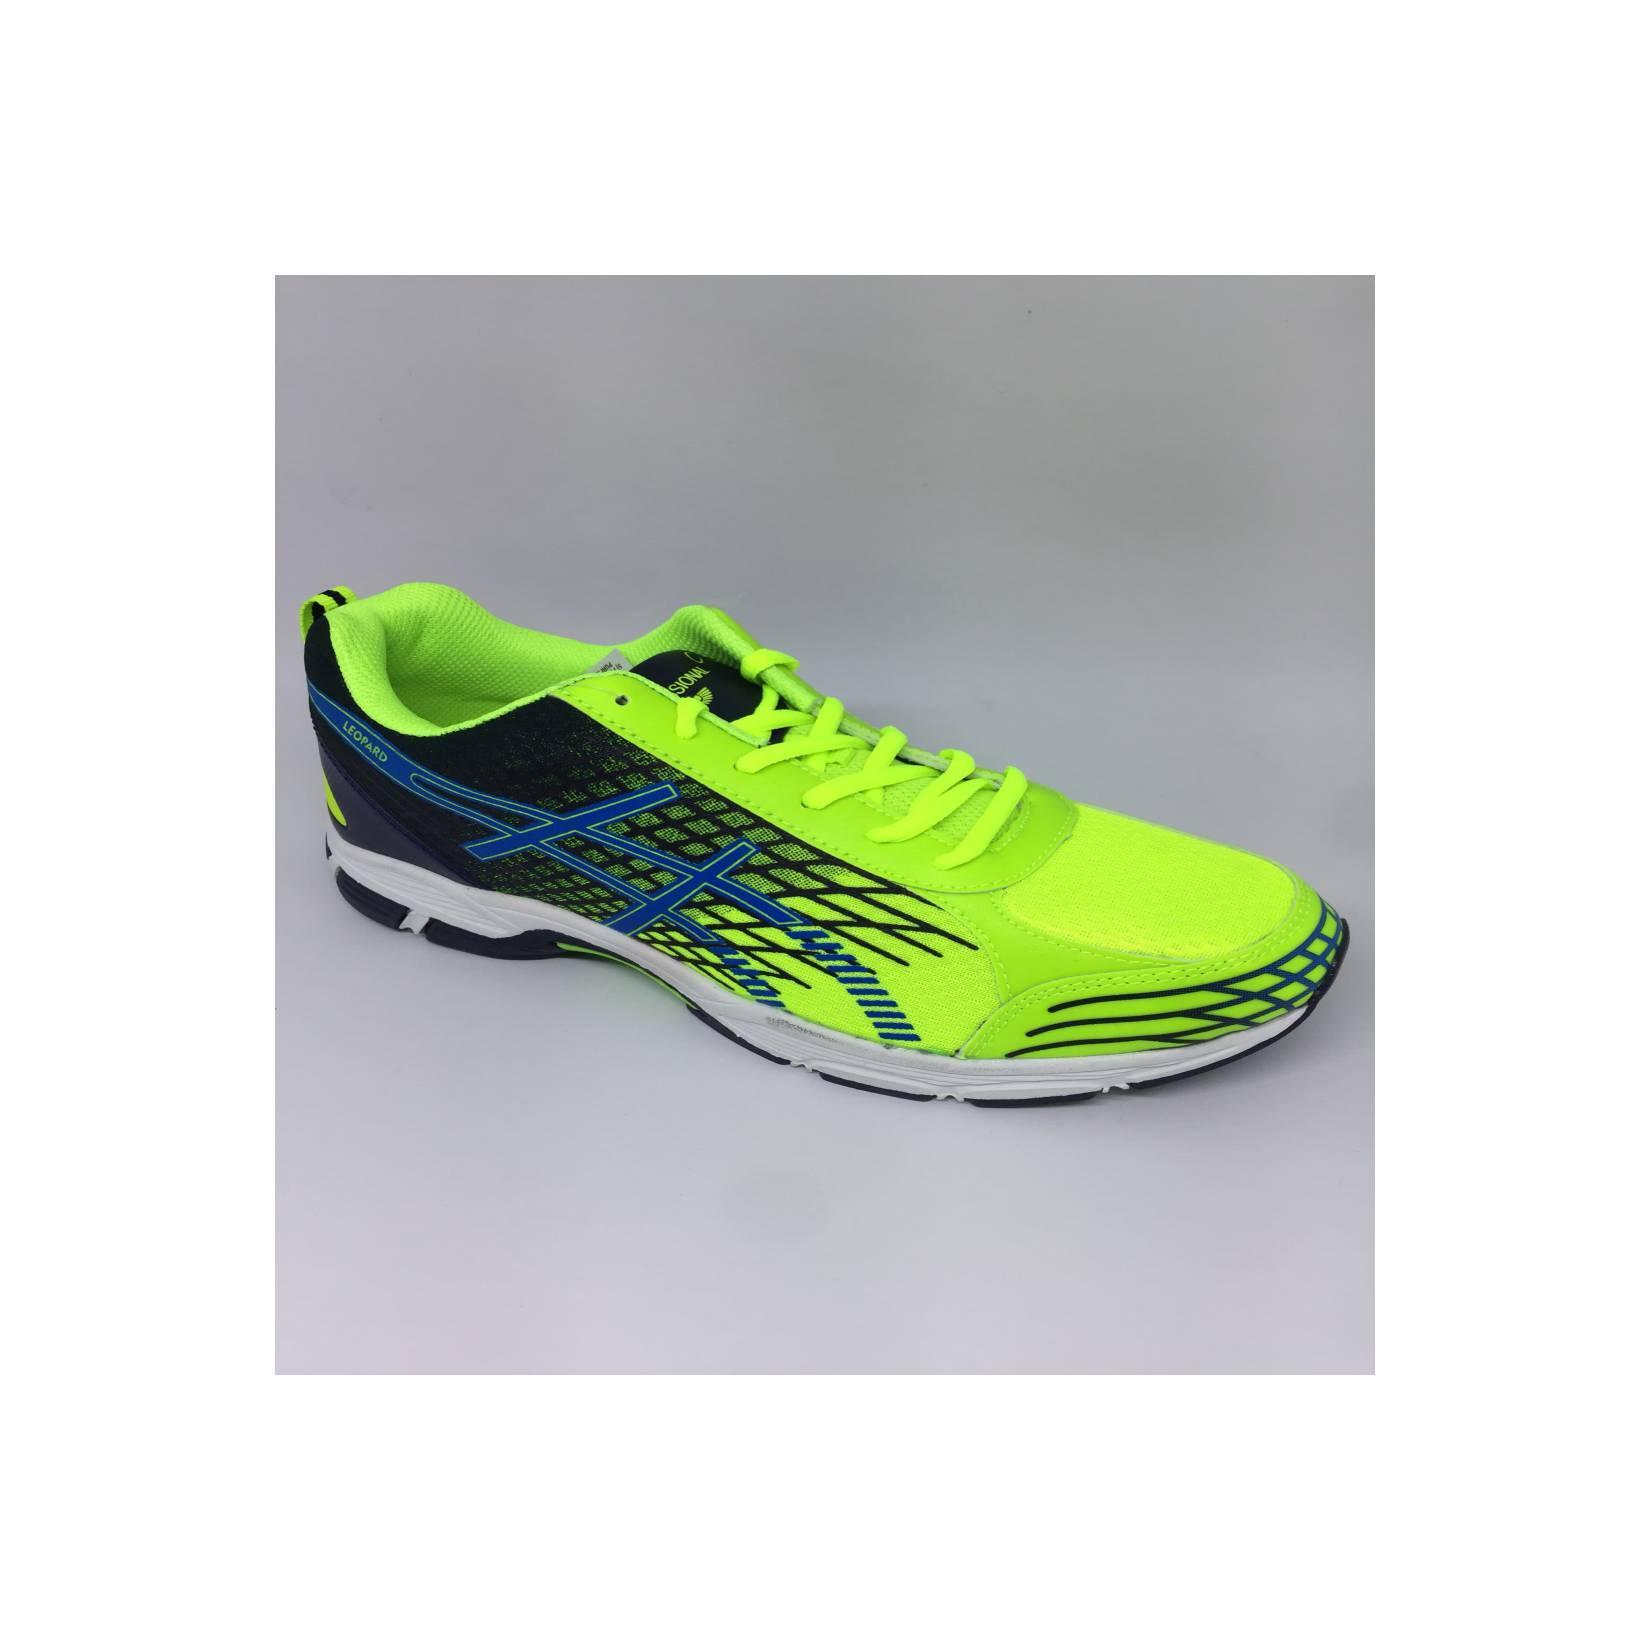 Sepatu running jogging Professional Leopard Stabilo new 2018